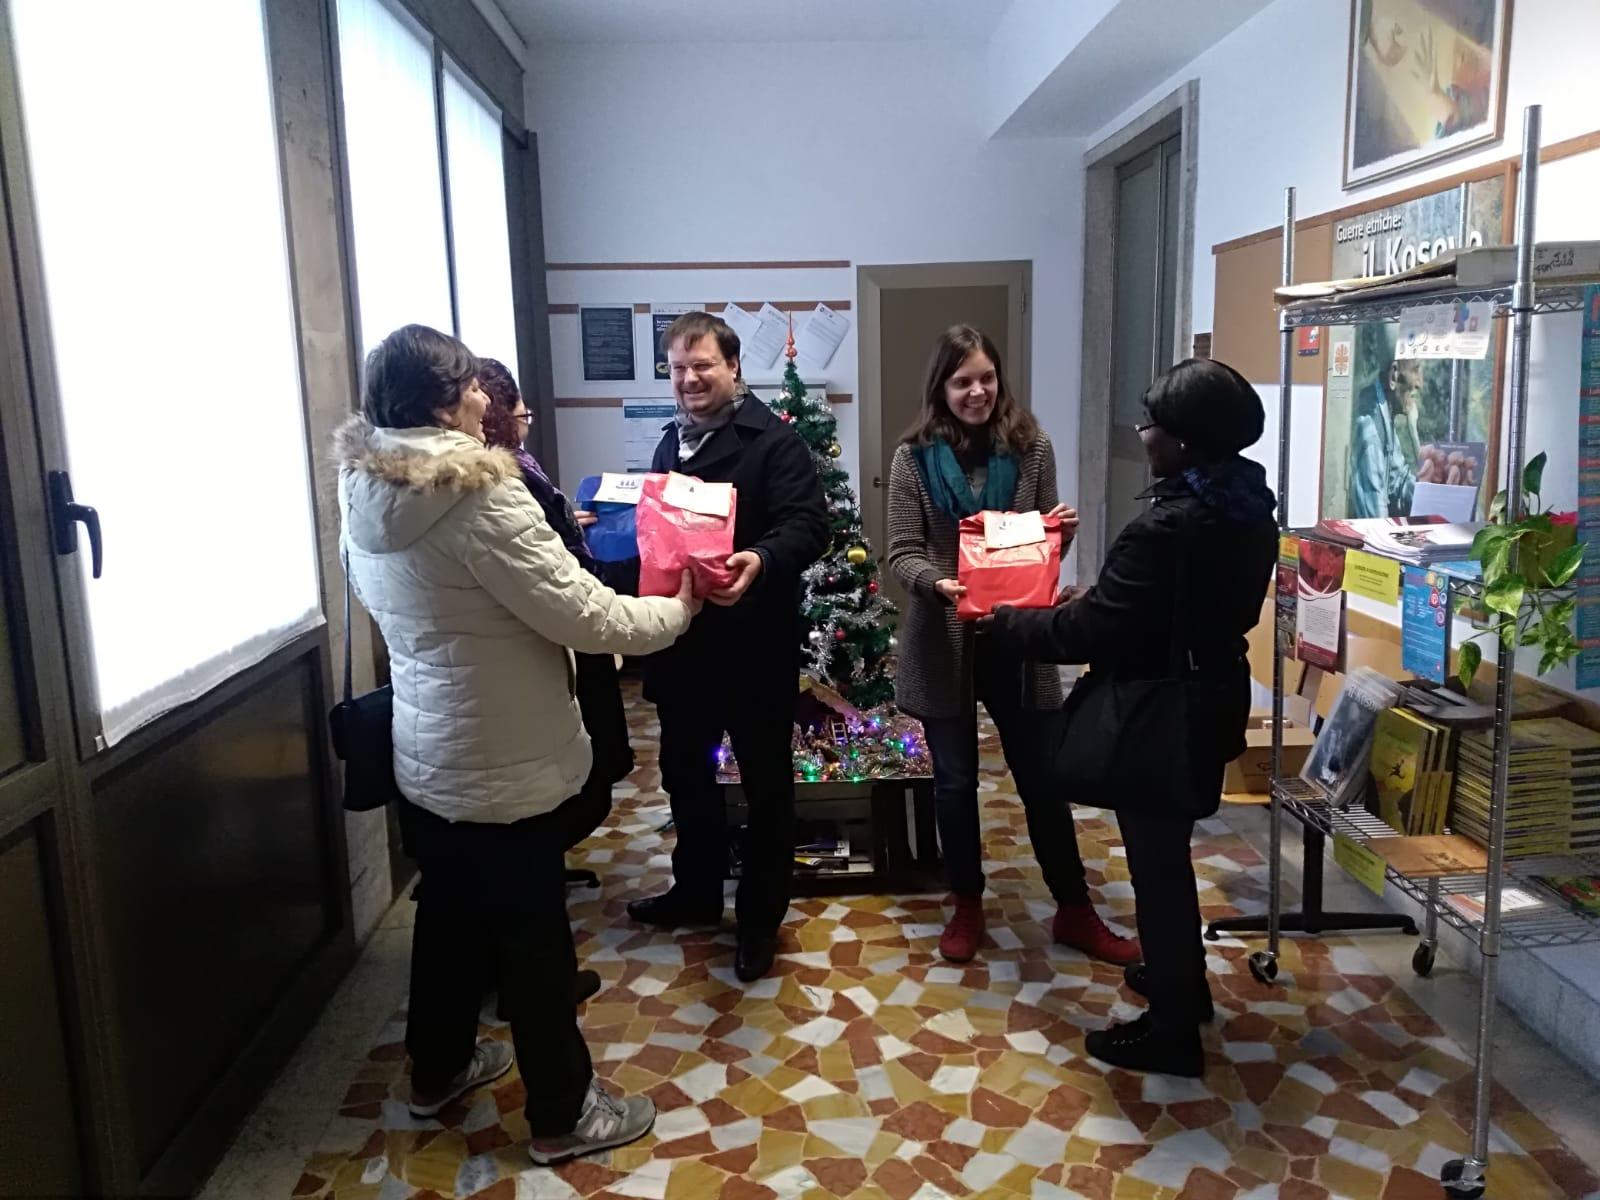 Kit di indumenti intimi donati dal progetto Golden Links a Caritas Diocesana Vicentina